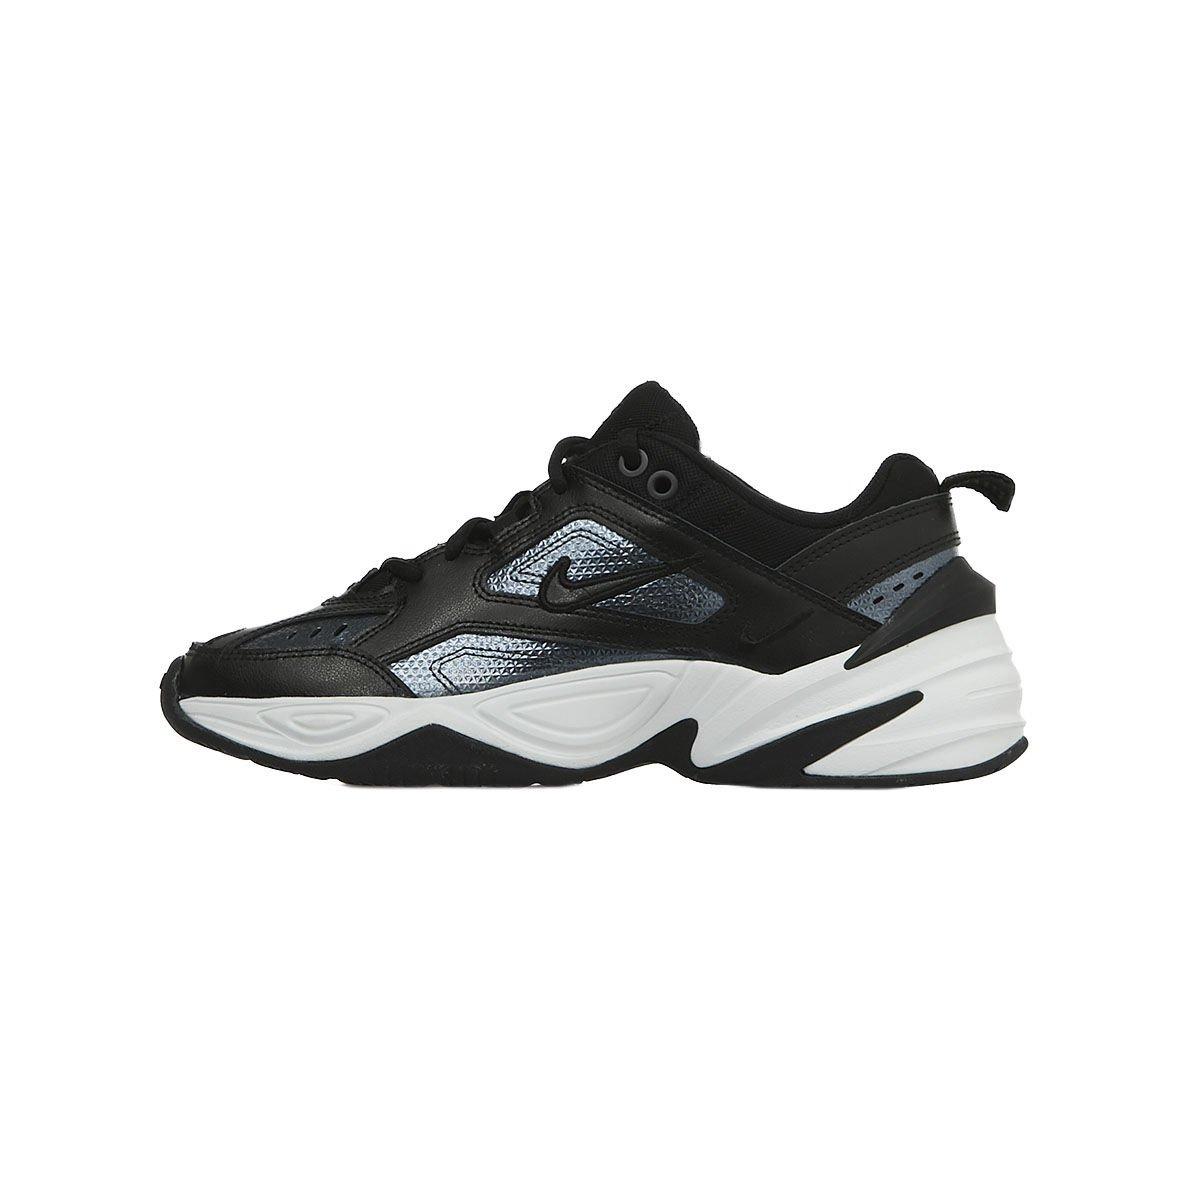 Sneakers Buty damskie Nike M2K Tekno ESS blackblack metallic hematite (CJ9583 001)